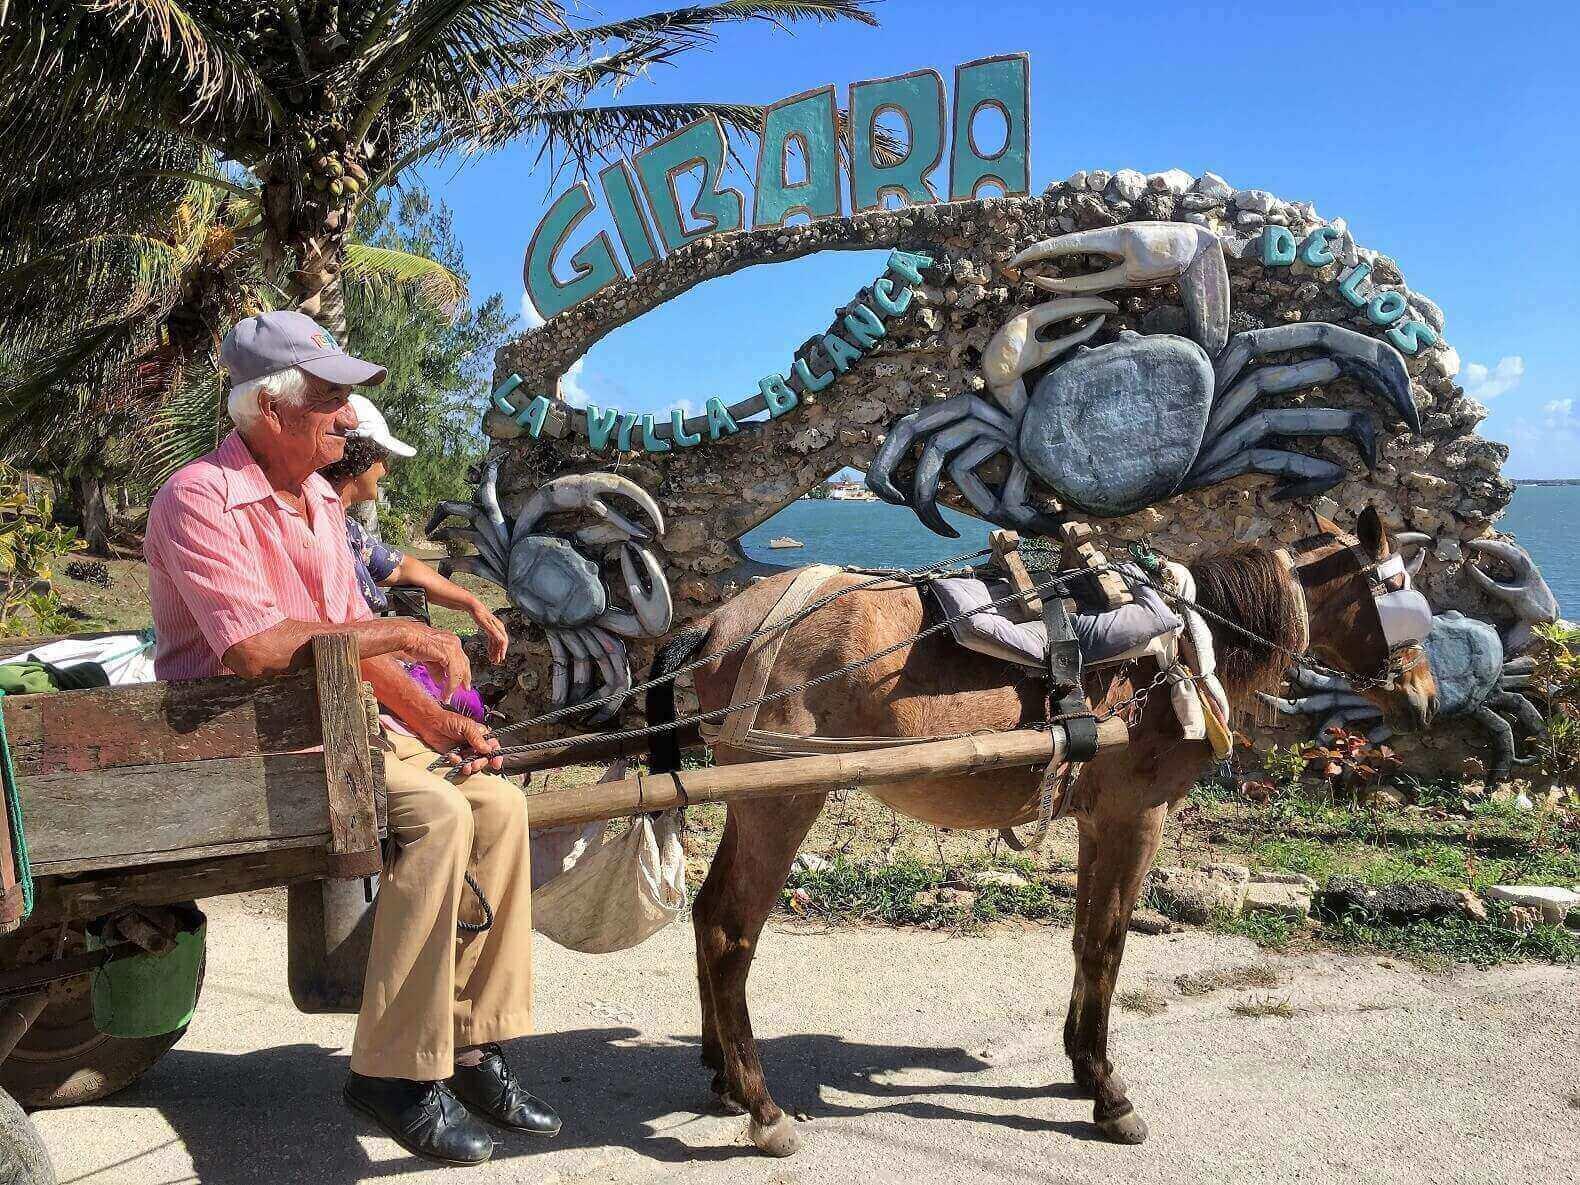 Horse and cart, Cuban transportation